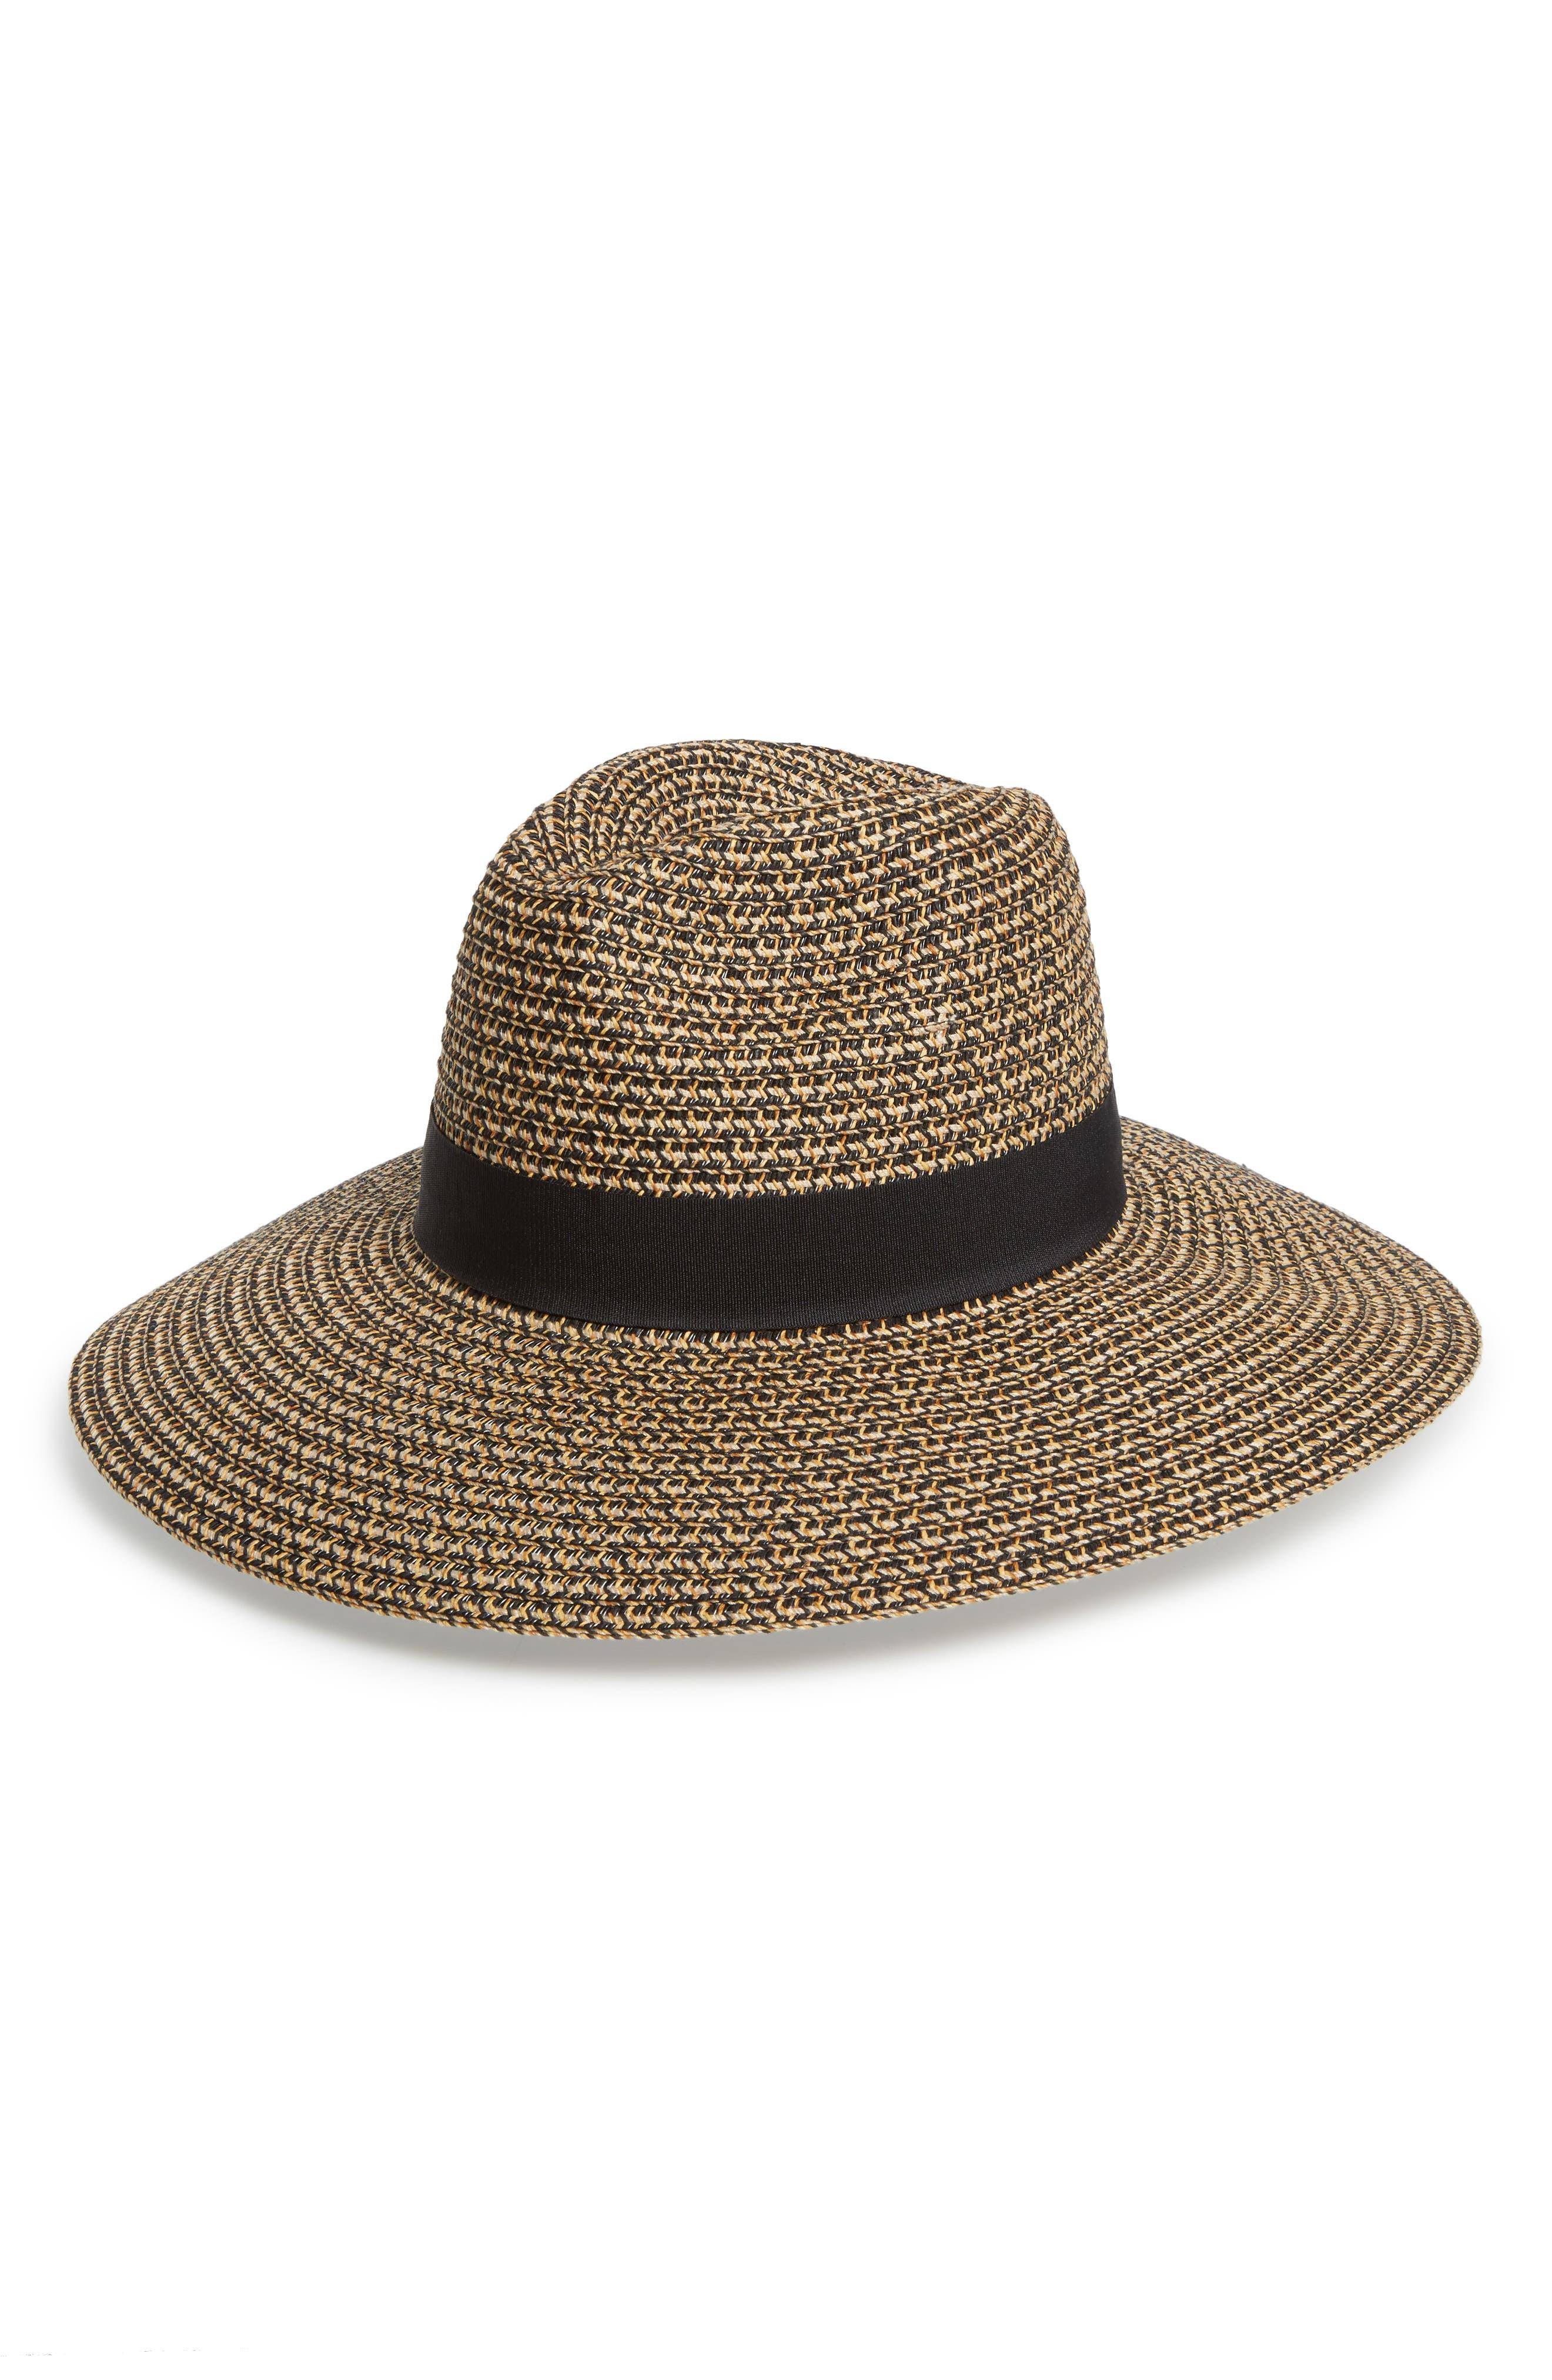 Woven Straw Sun Hat,                             Main thumbnail 1, color,                             005